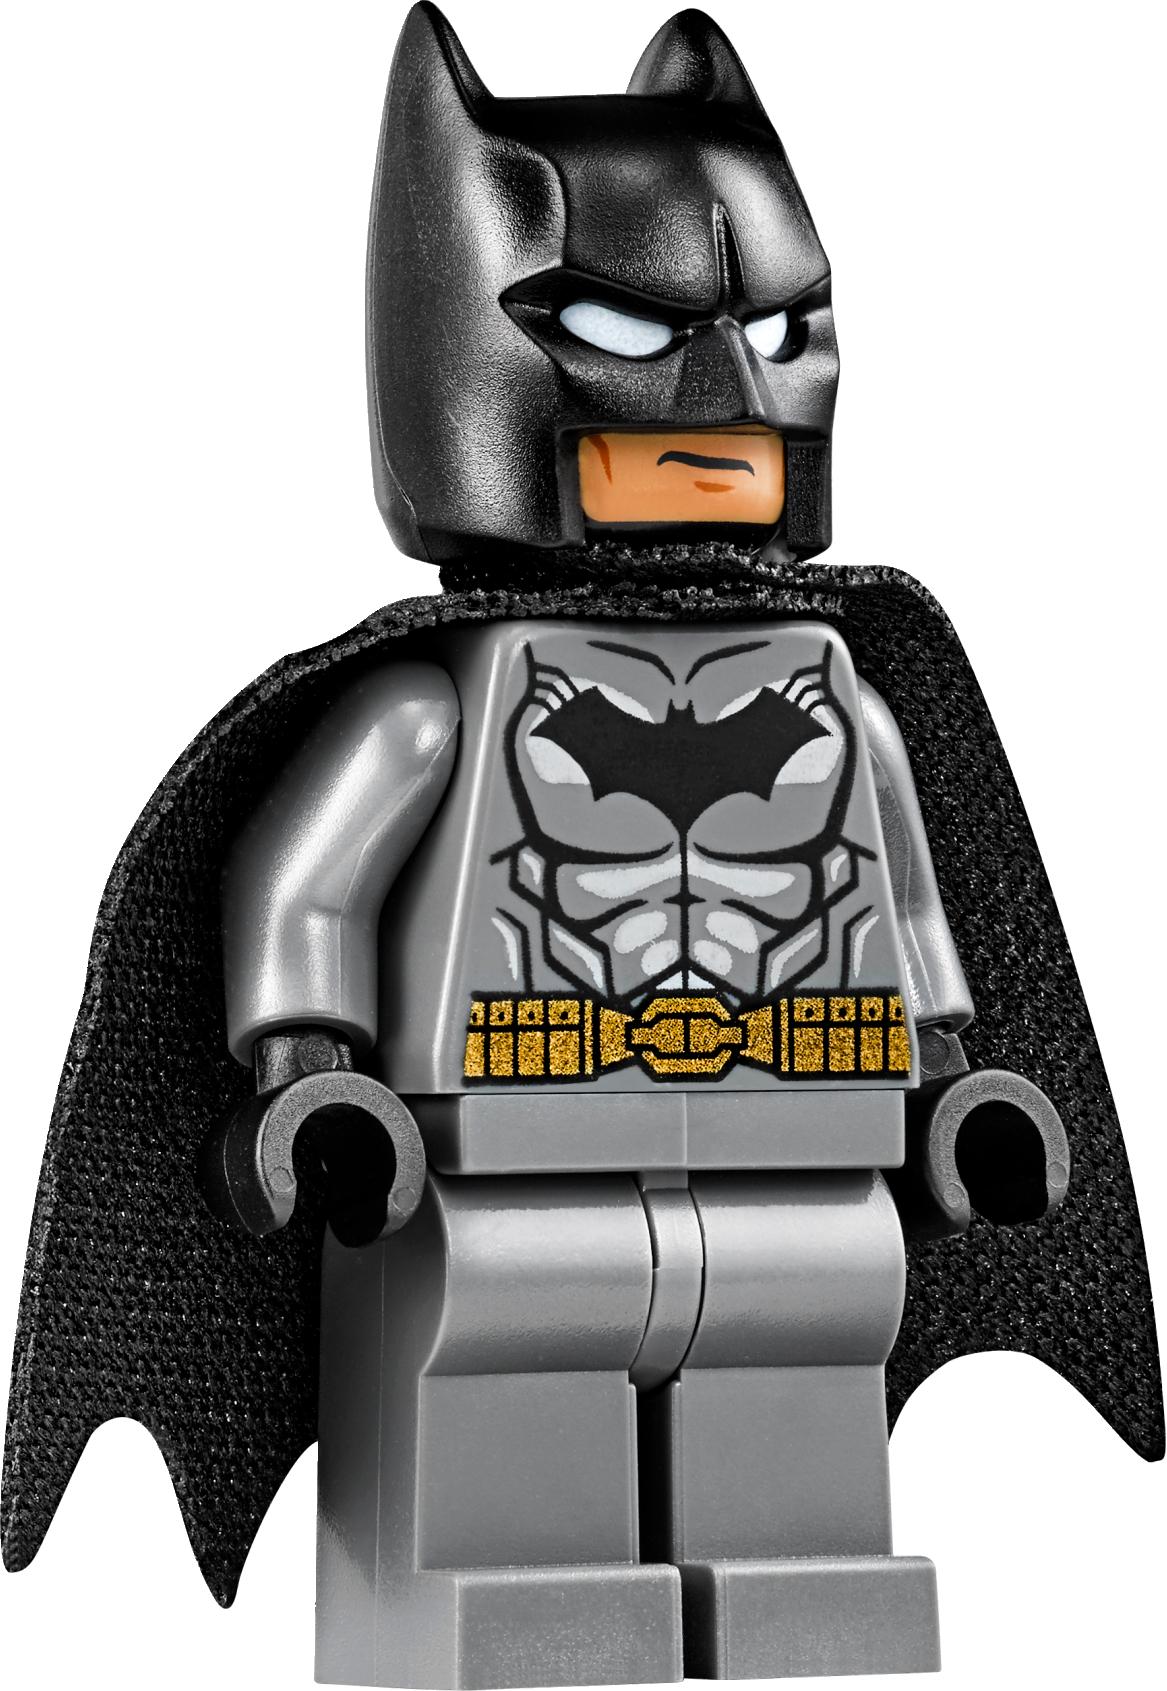 Batman™: Gotham City Cycle Chase